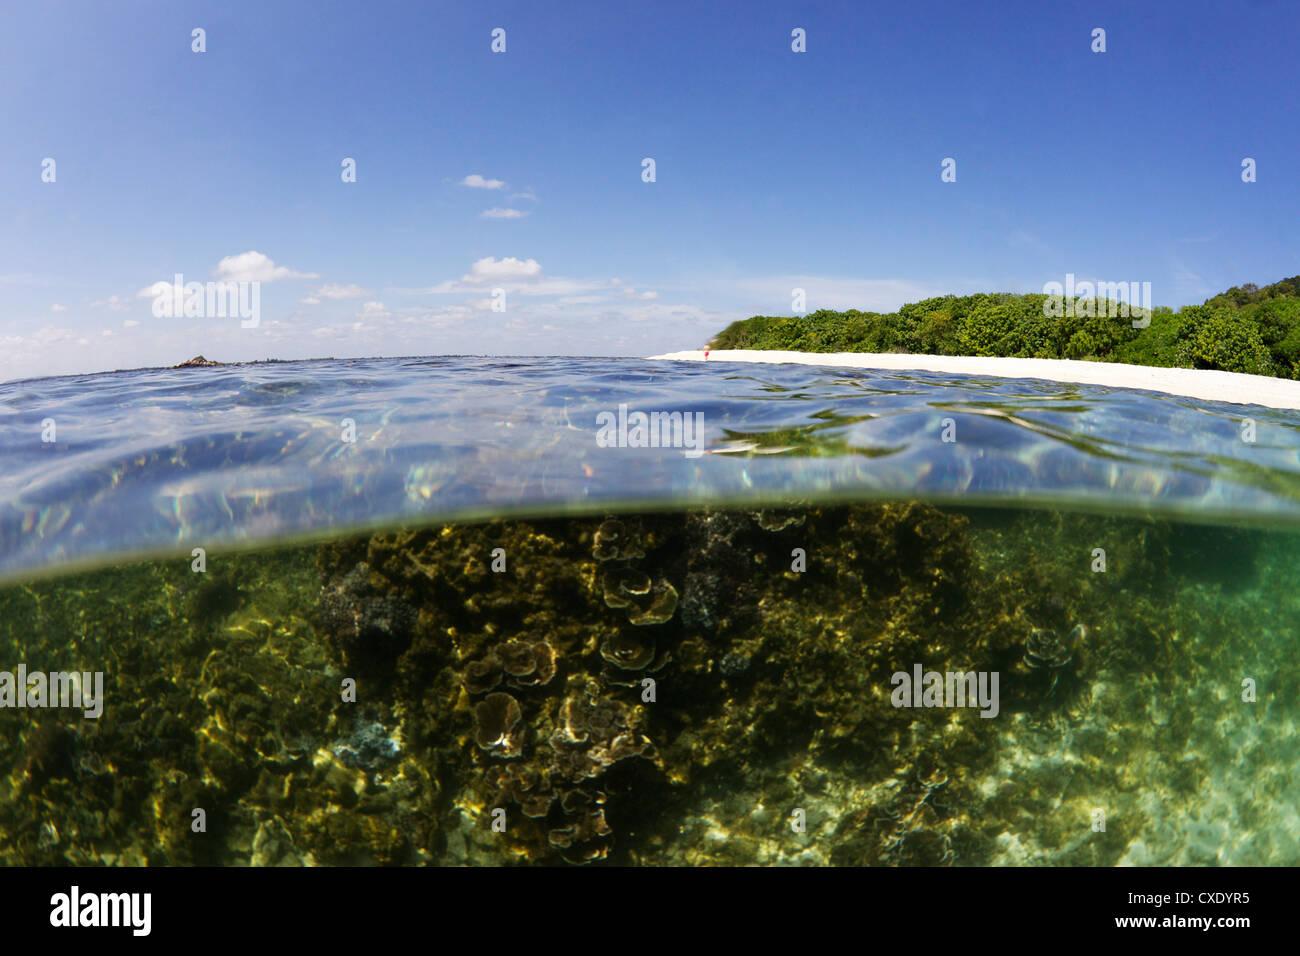 Half underwater split view of Coral Beach on Pigeon Island National Park, Trincomalee, Sri Lanka, Asia - Stock Image